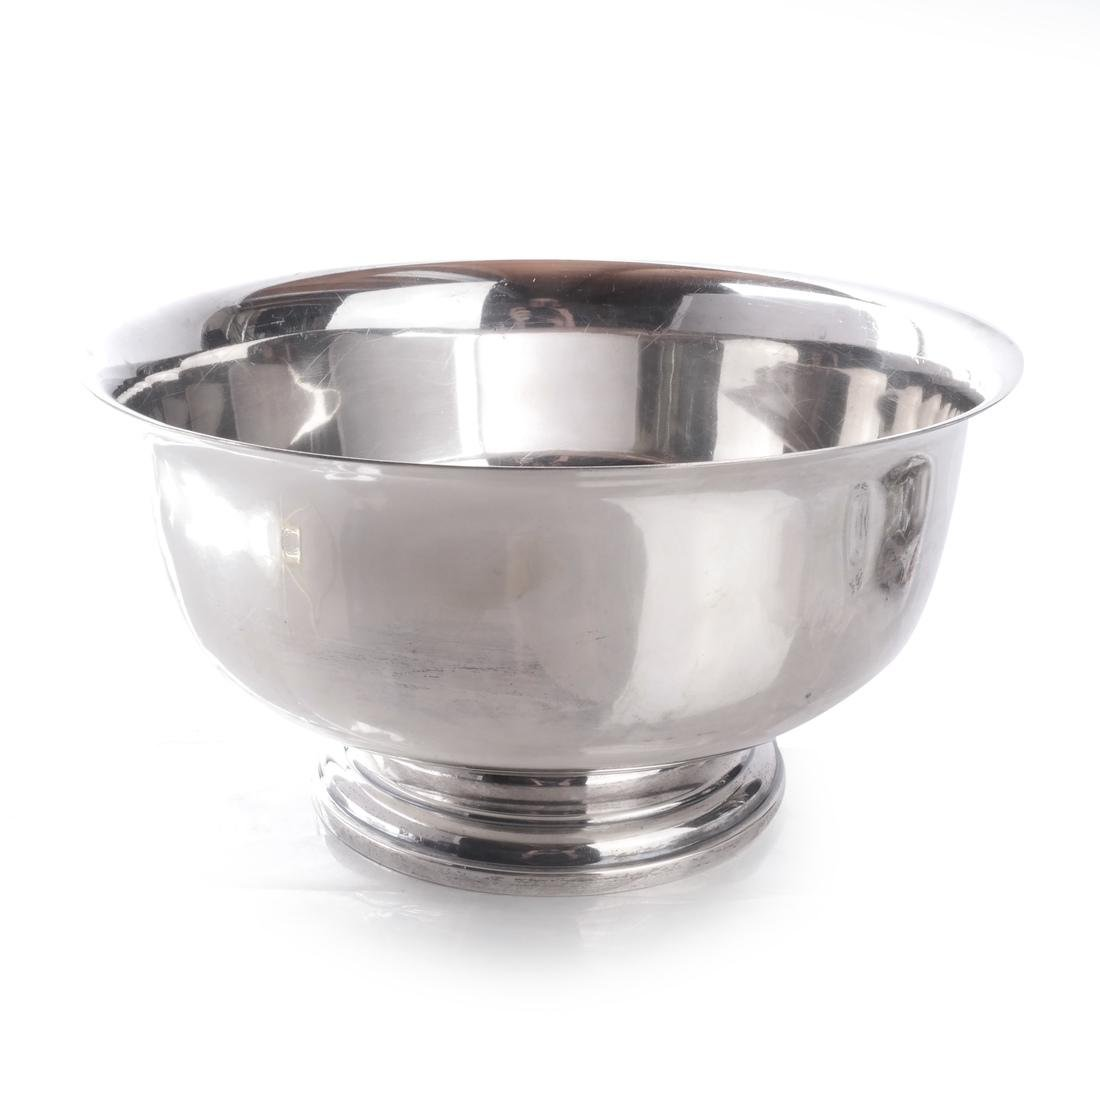 American .925 Sterling Silver Revere Bowl